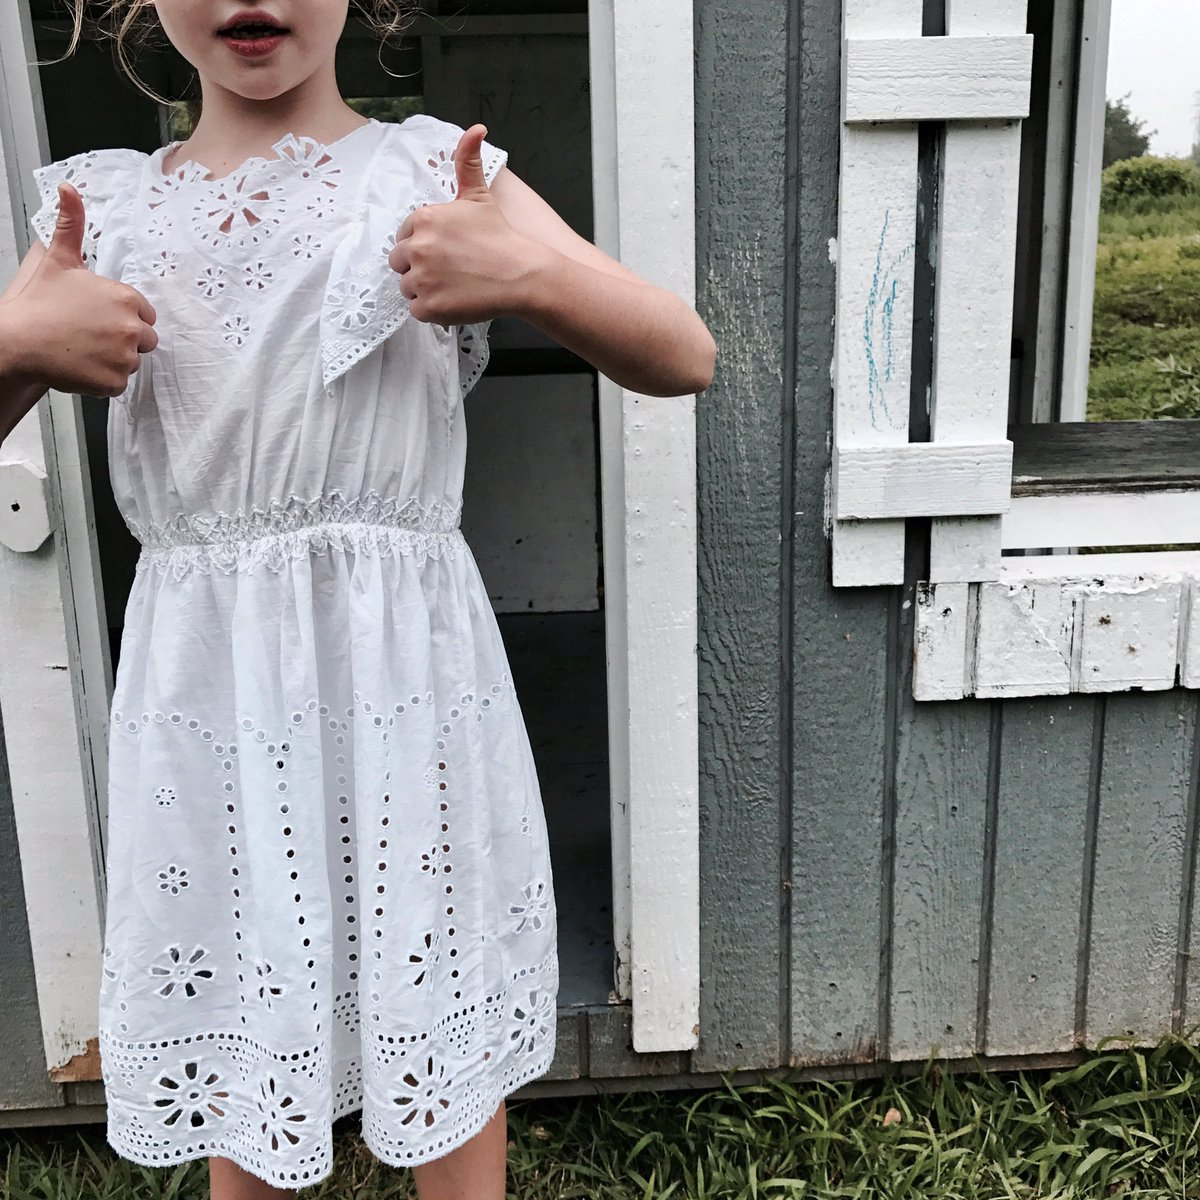 Double Dutch x Stella   #StellaKids https://t.co/lhaNCFUR1Z